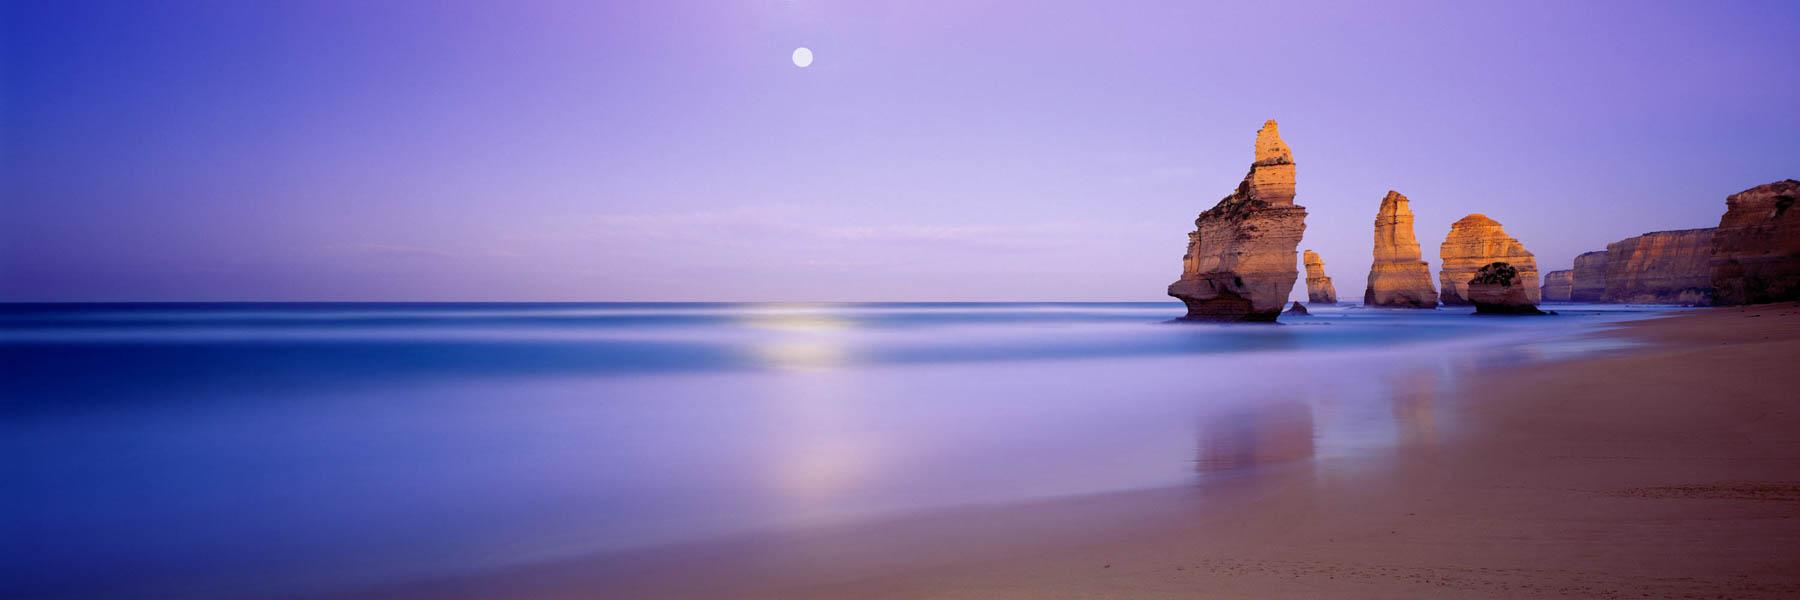 A full moon at sunrise over The Twelve Apostles, Victoria, Australia.